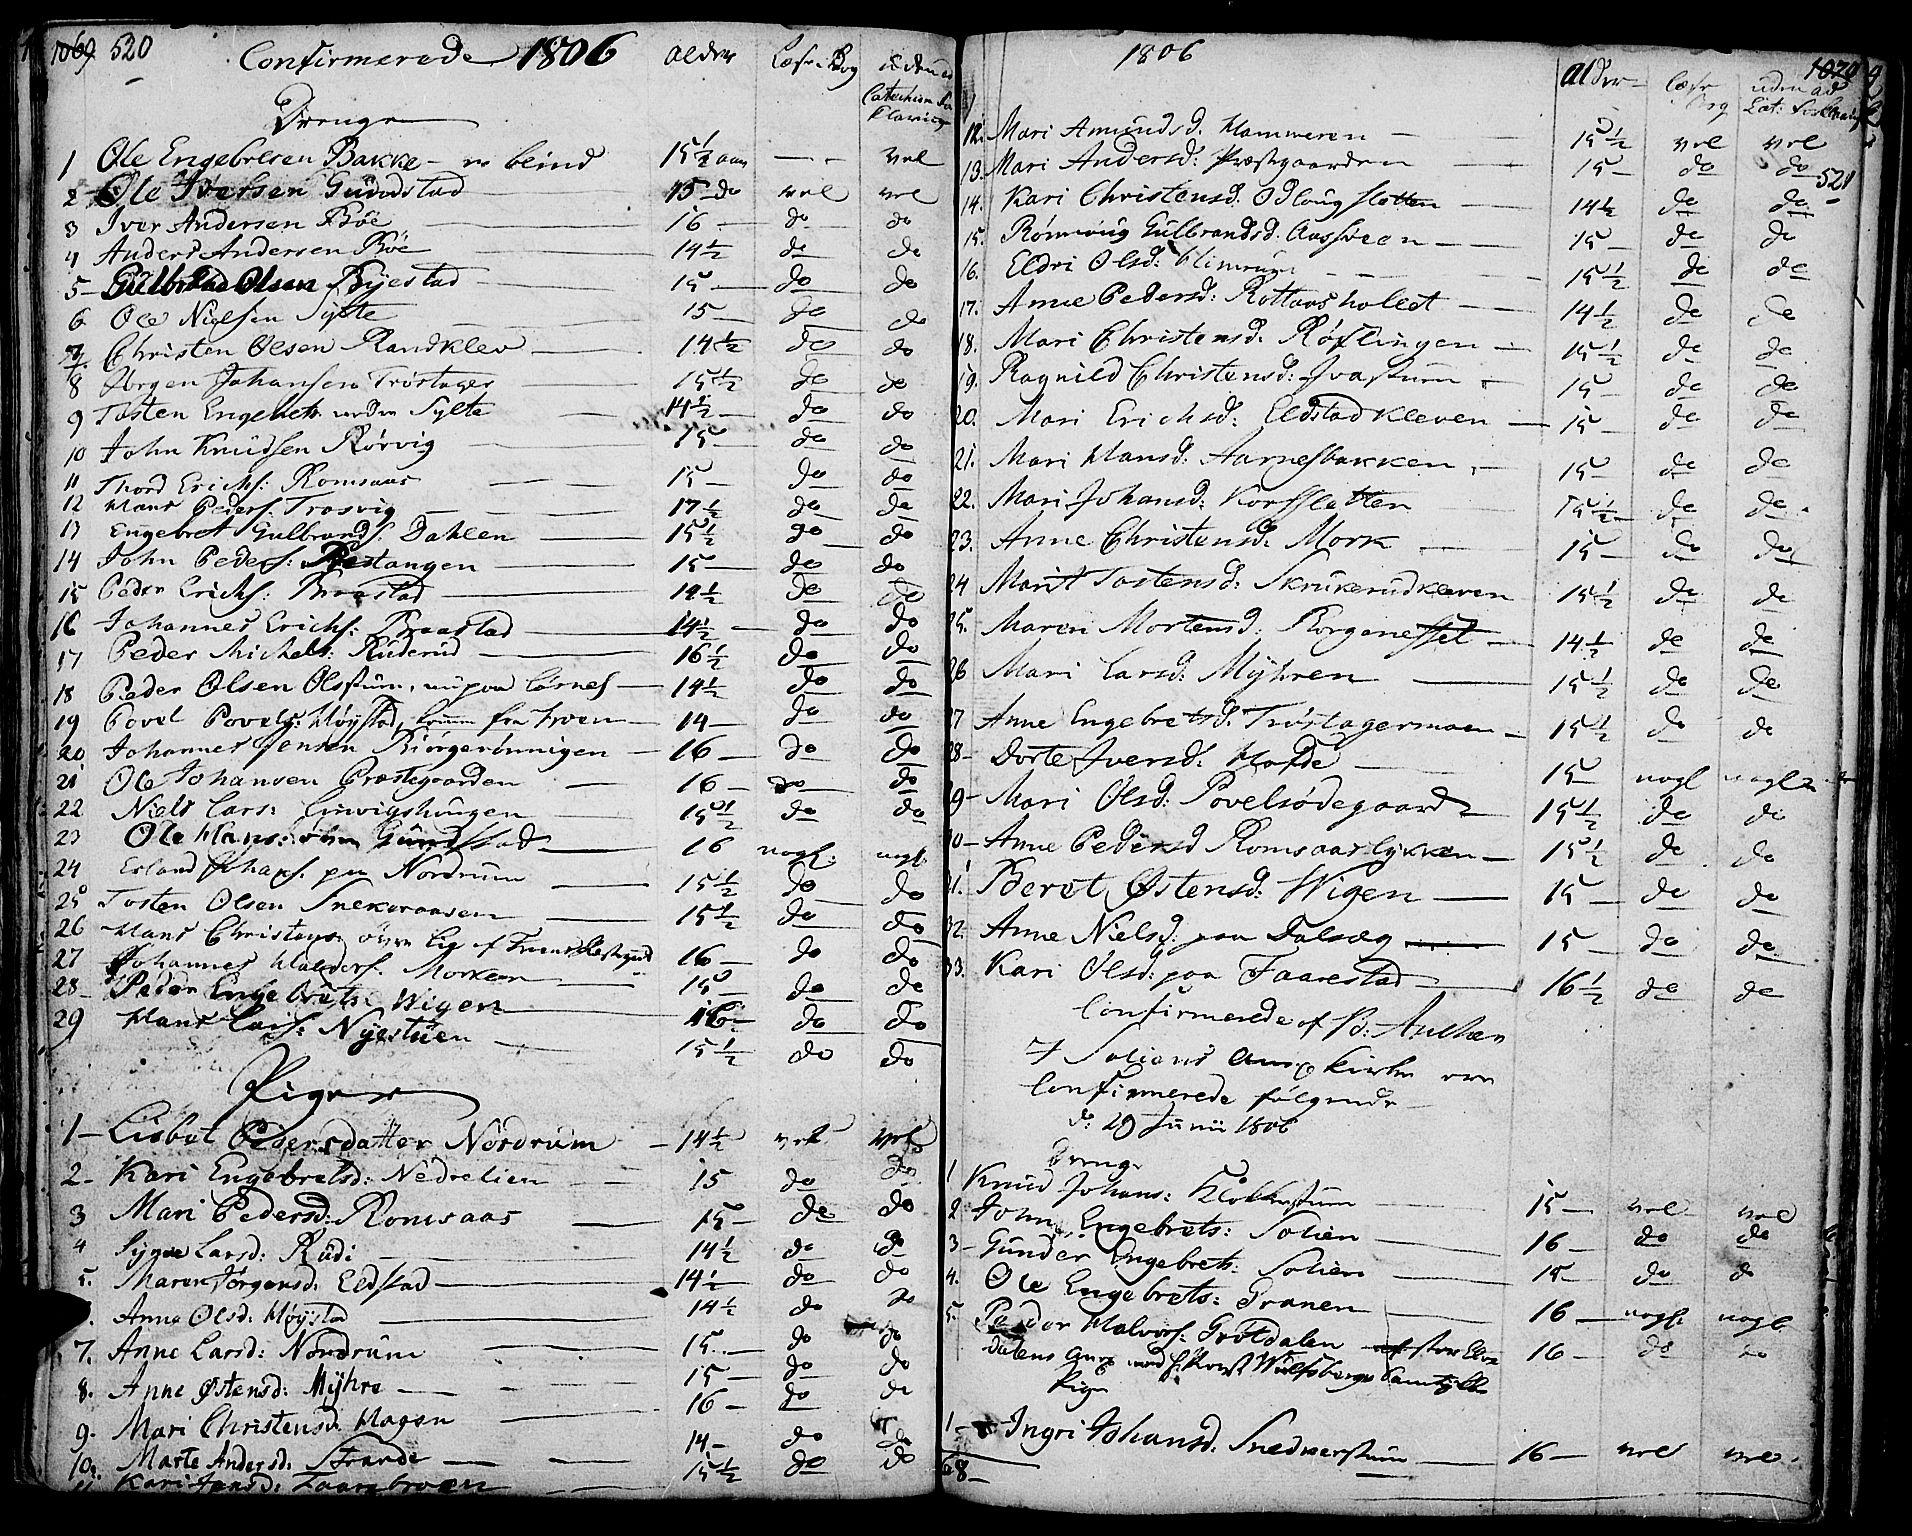 SAH, Ringebu prestekontor, Ministerialbok nr. 3, 1781-1820, s. 520-521